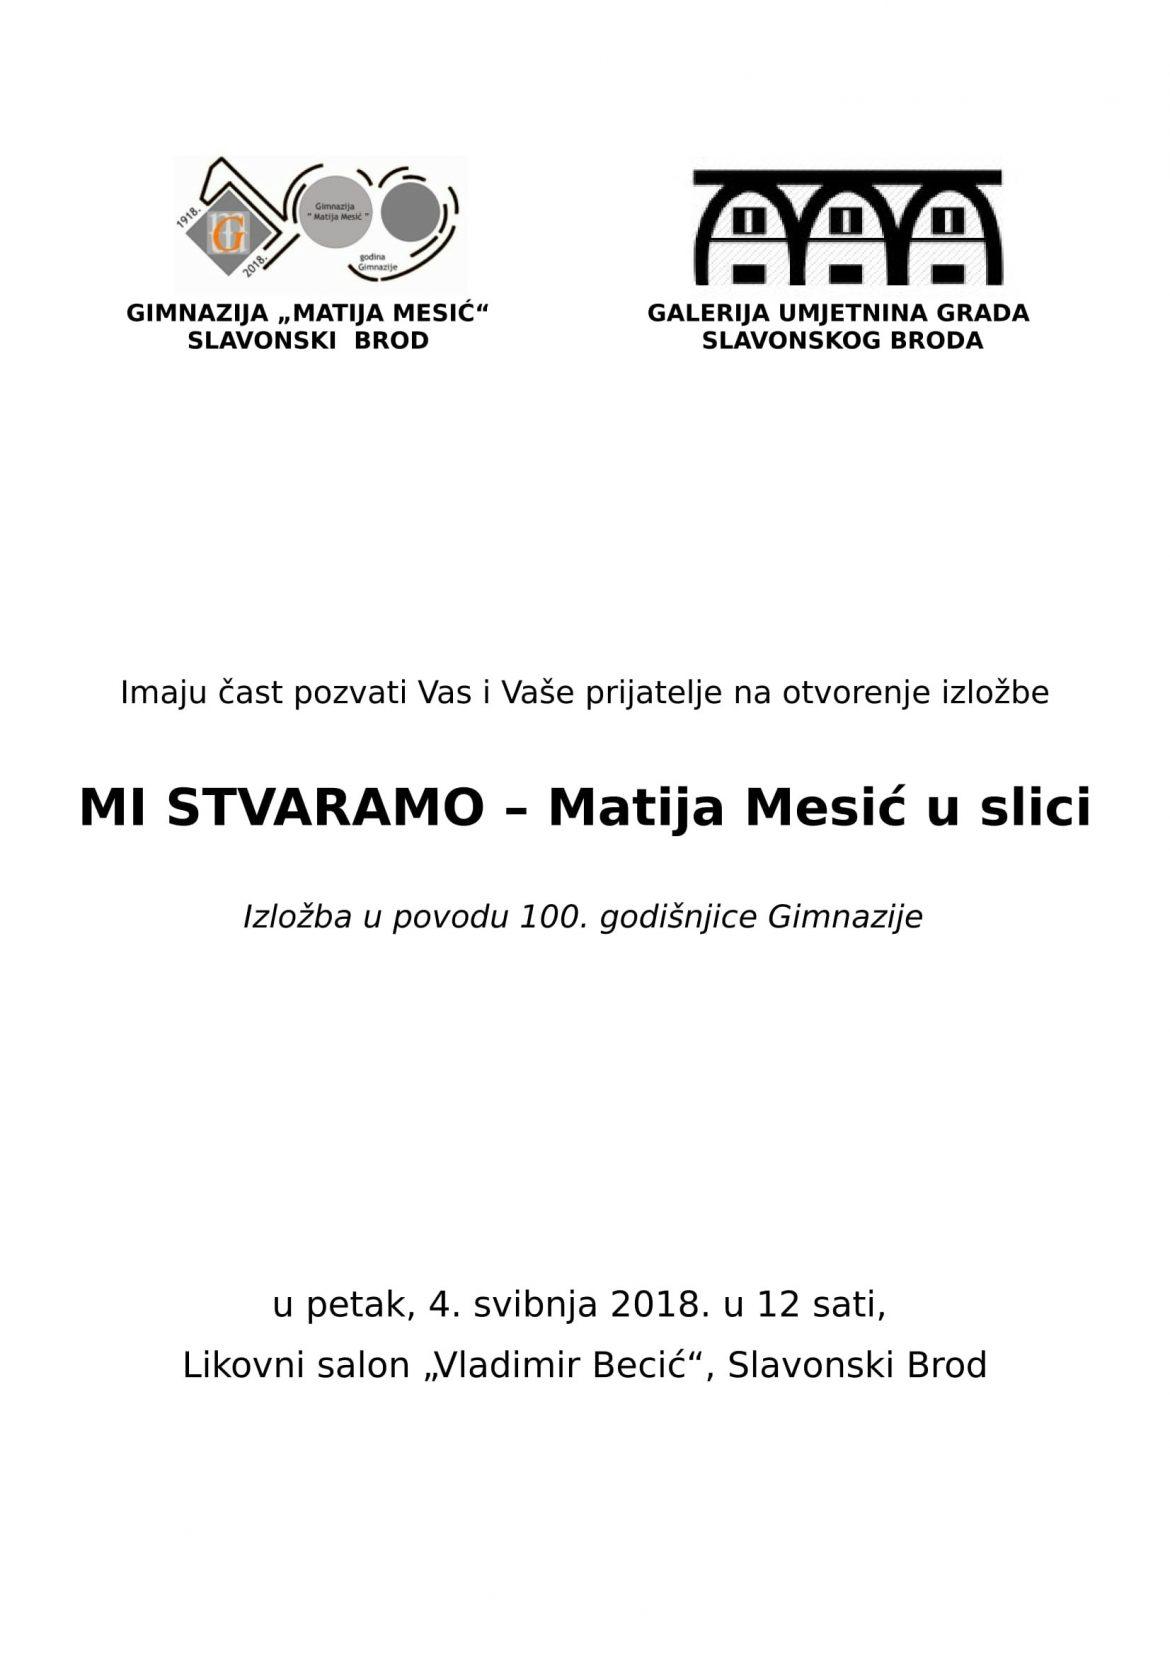 matija_mesic